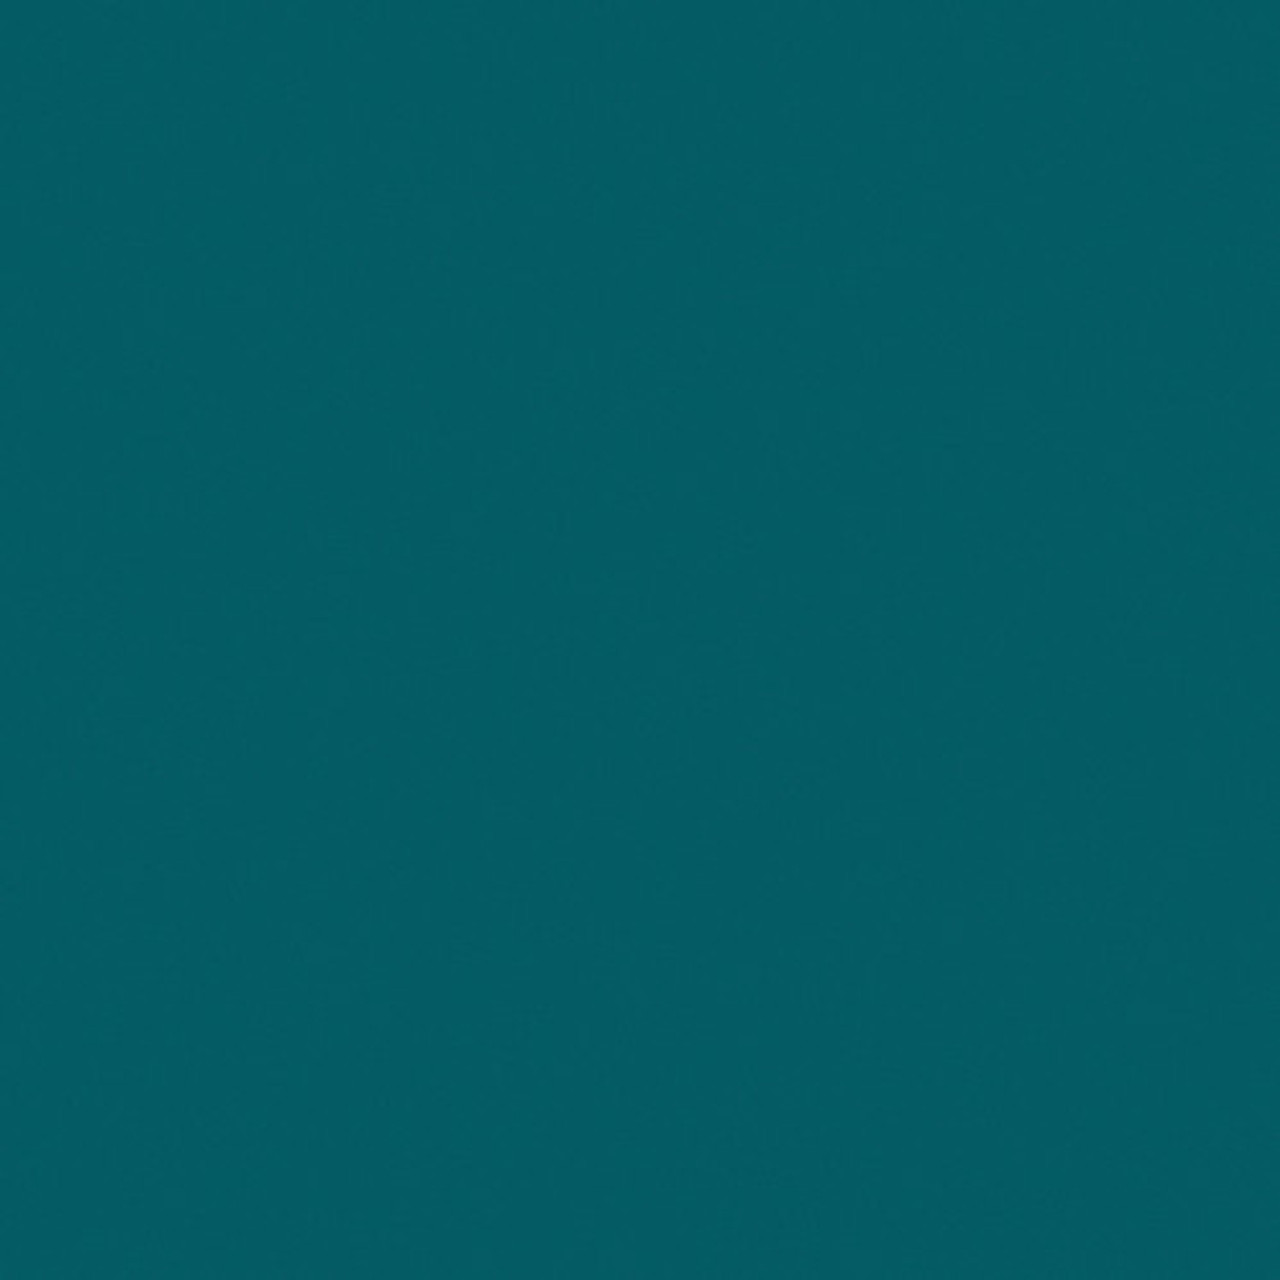 "#0095 Rosco Gels Roscolux Medium Blue Green, 20x24"""